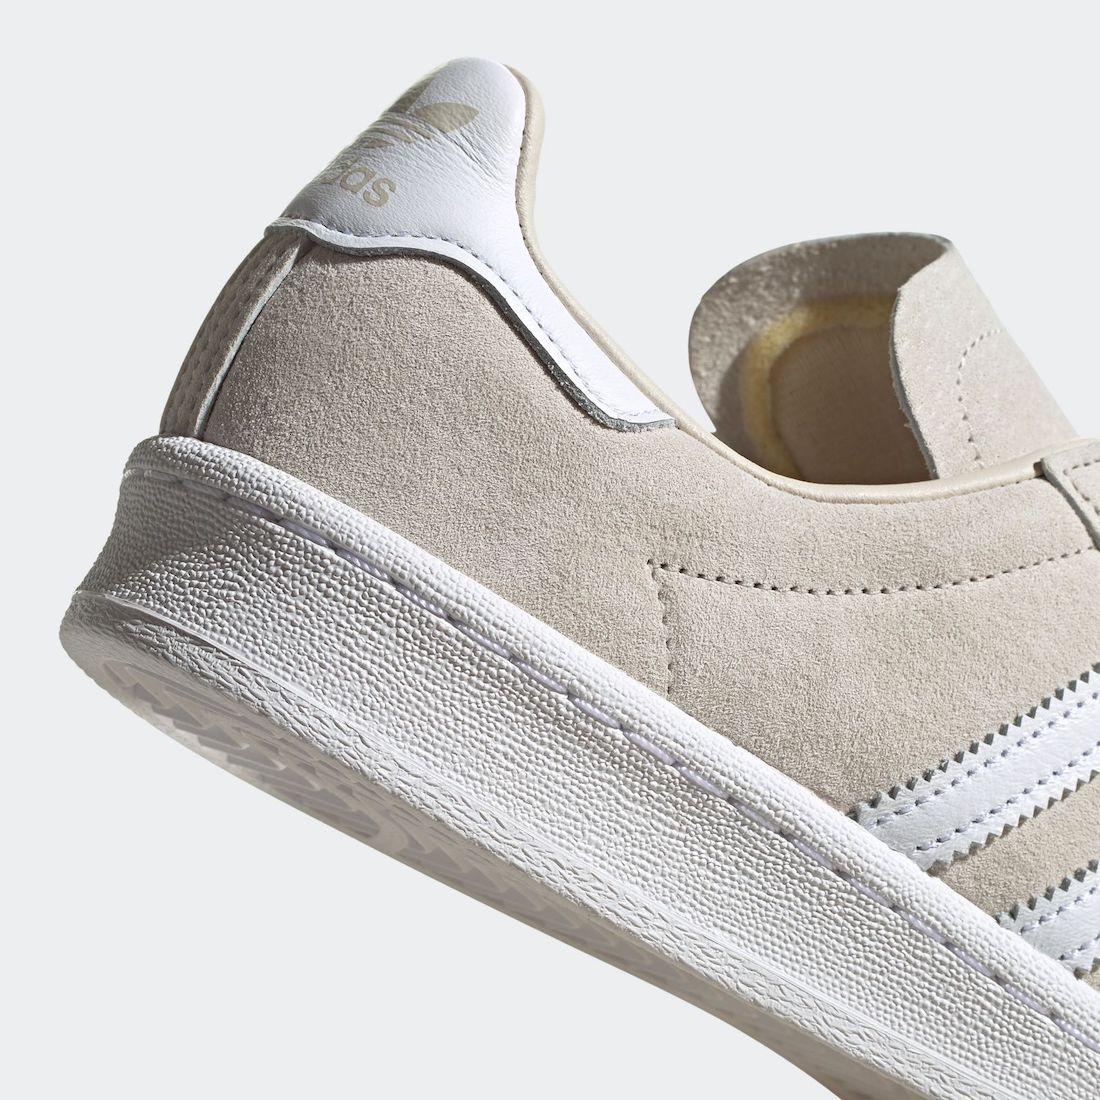 adidas Campus 80s Alumina FX5457 Release Date Info